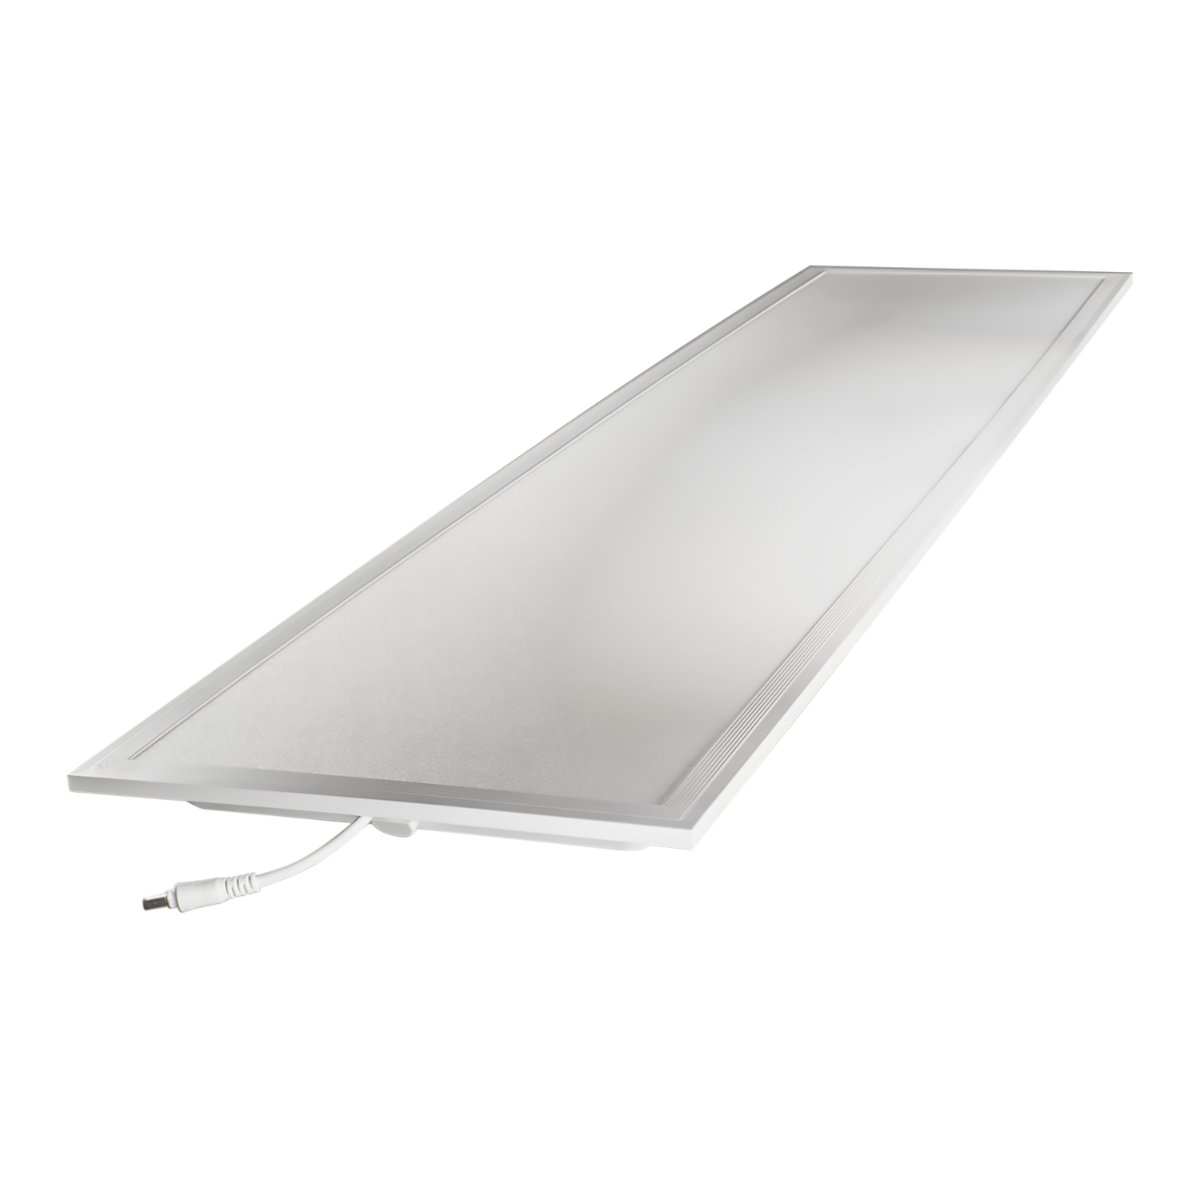 Noxion LED Panel Delta Pro V2.0 Xitanium DALI 30W 30x120cm 3000K 3960lm UGR <19 | Dali Dimmable - Warm White - Replaces 2x36W